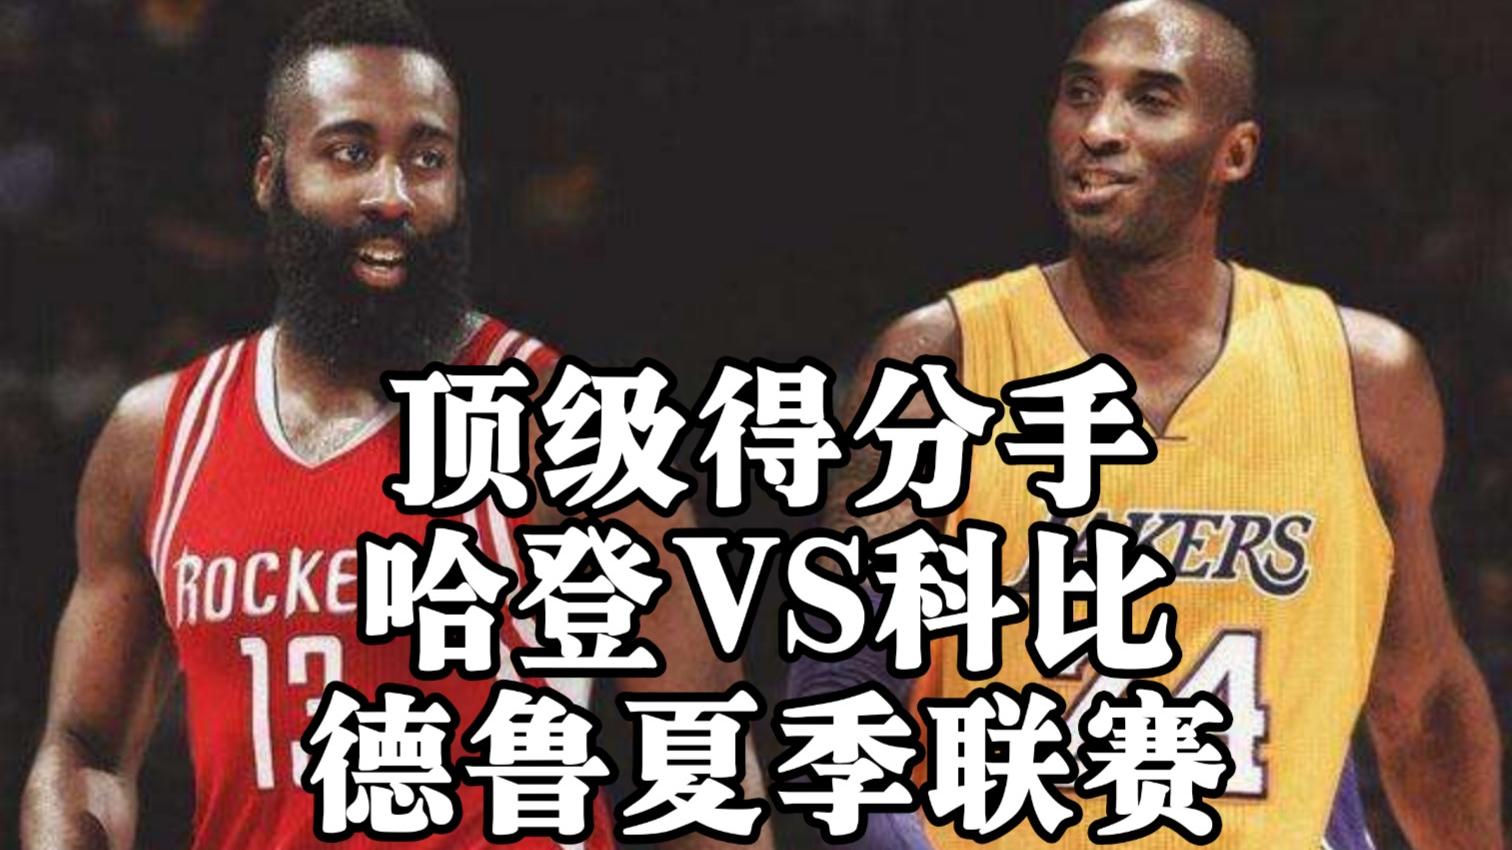 【NBA球星互爆】哈登大战科比 德鲁夏季联赛 顶级得分手之争!